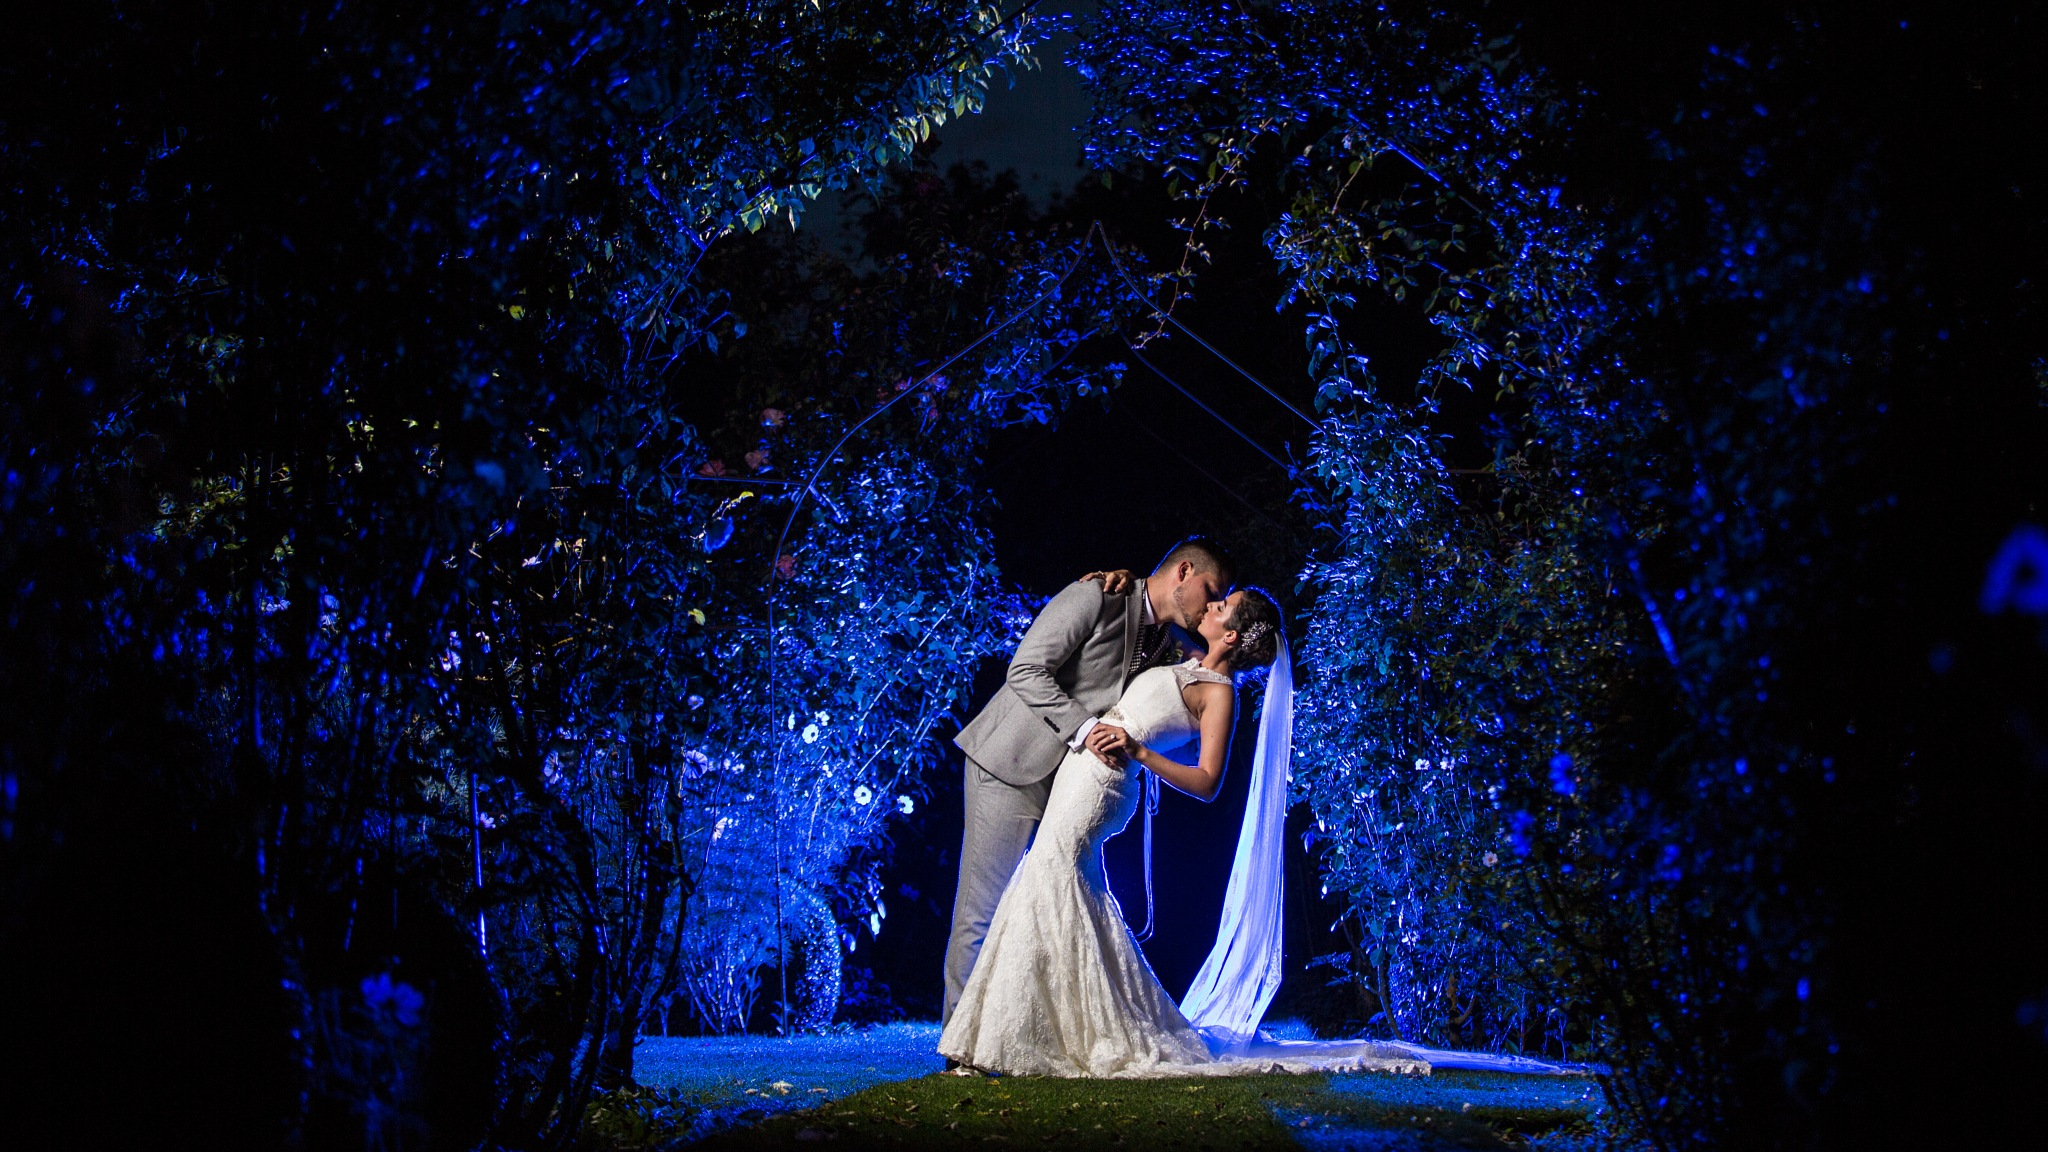 blue love  by Steven sparkes